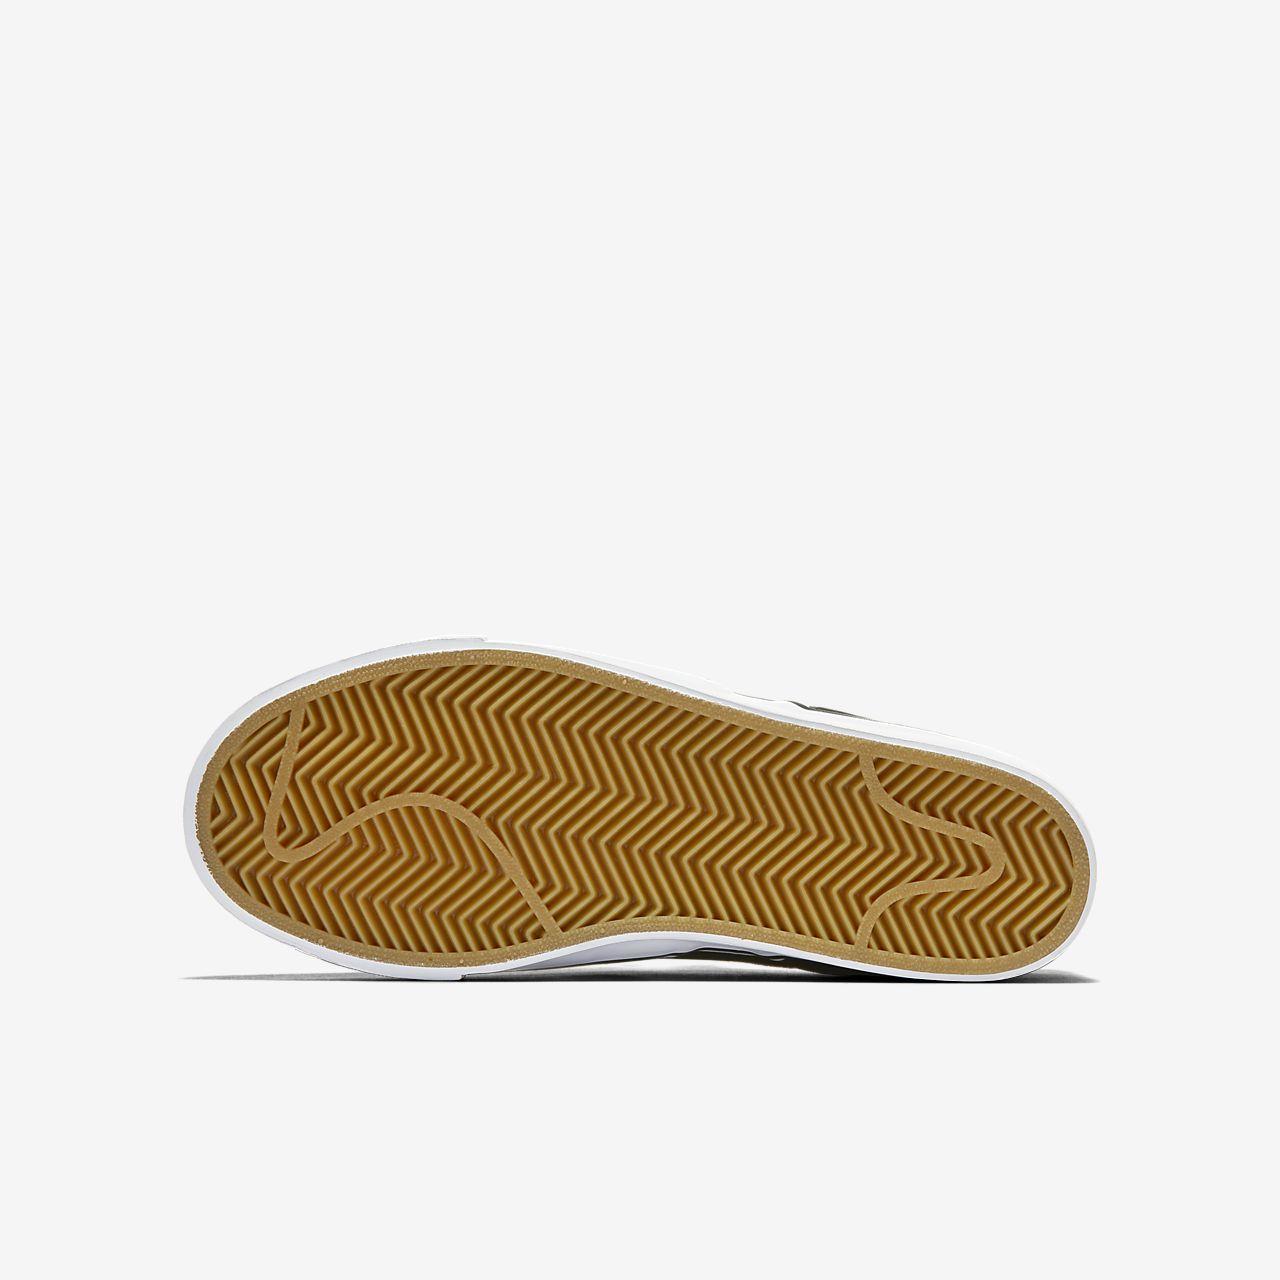 reputable site bad48 40028 ... Nike SB Stefan Janoski Canvas Slip-on Big Kids  Skateboarding Shoe